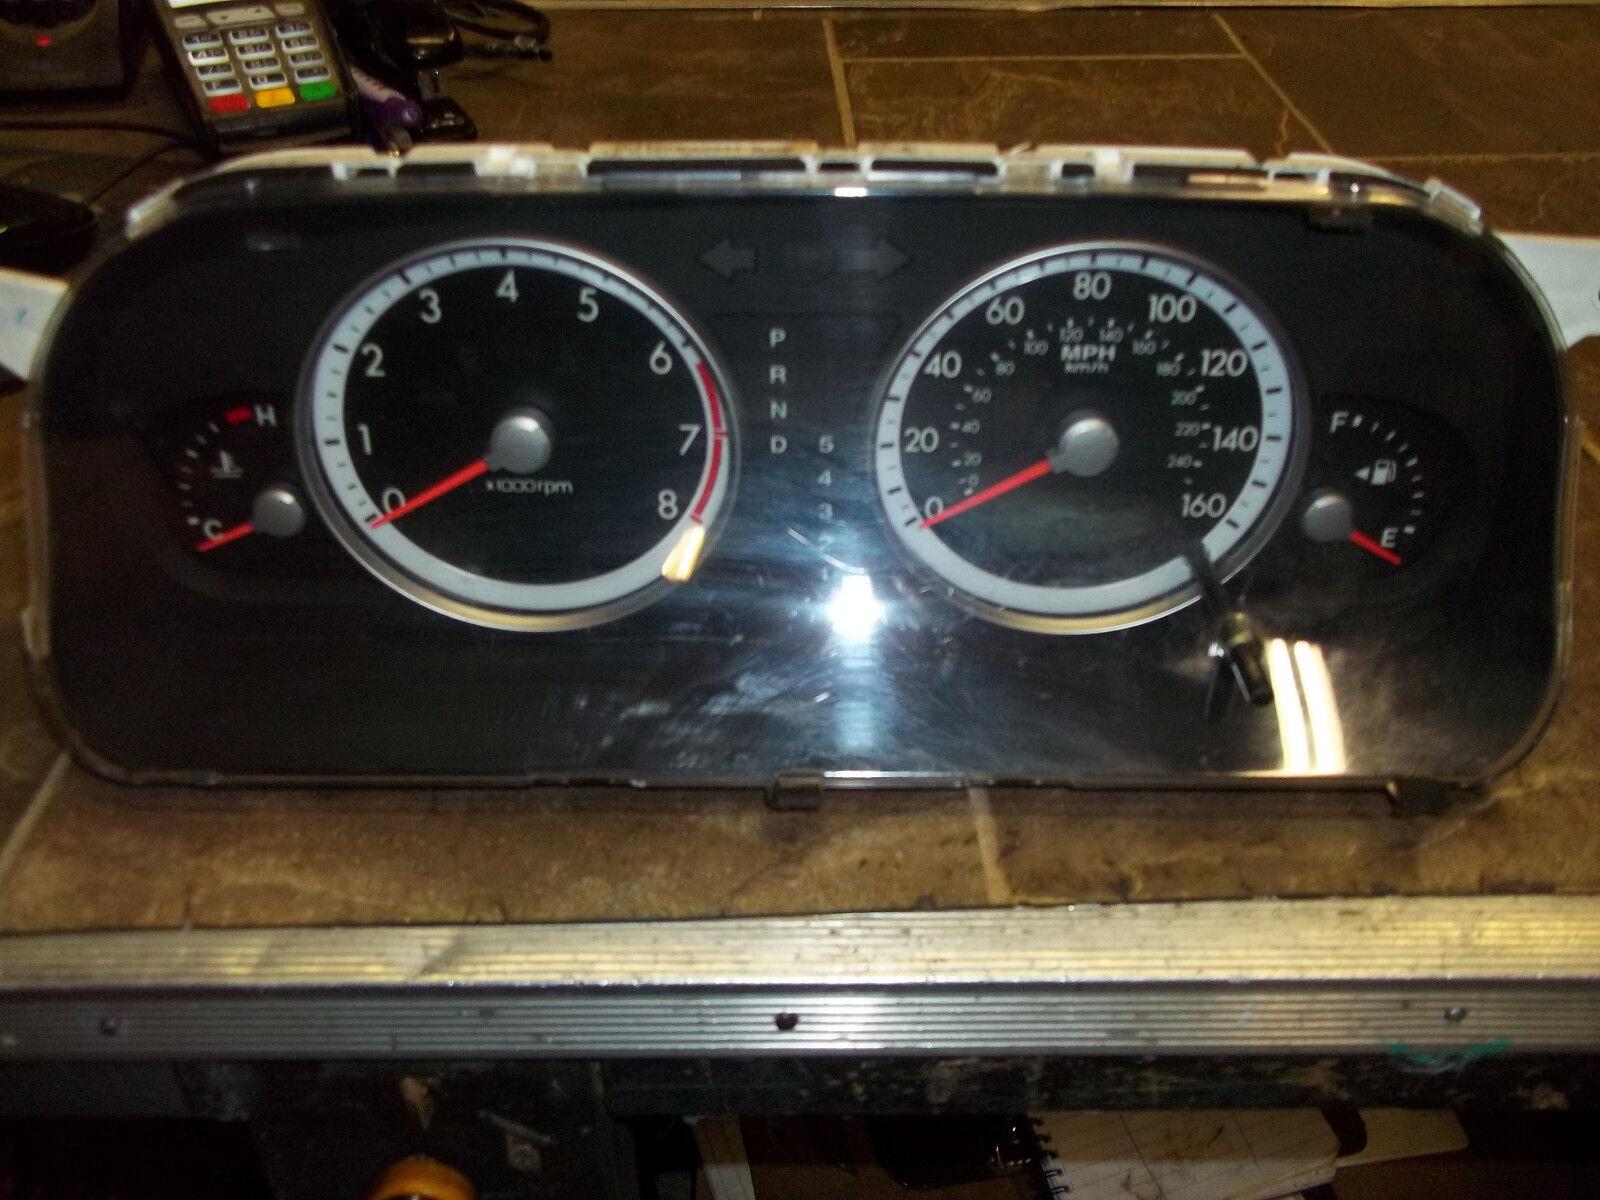 2005 Kia Amanti Dash Fuse Box Speedometer Instrument Cluster Panel Gauges 1600x1200